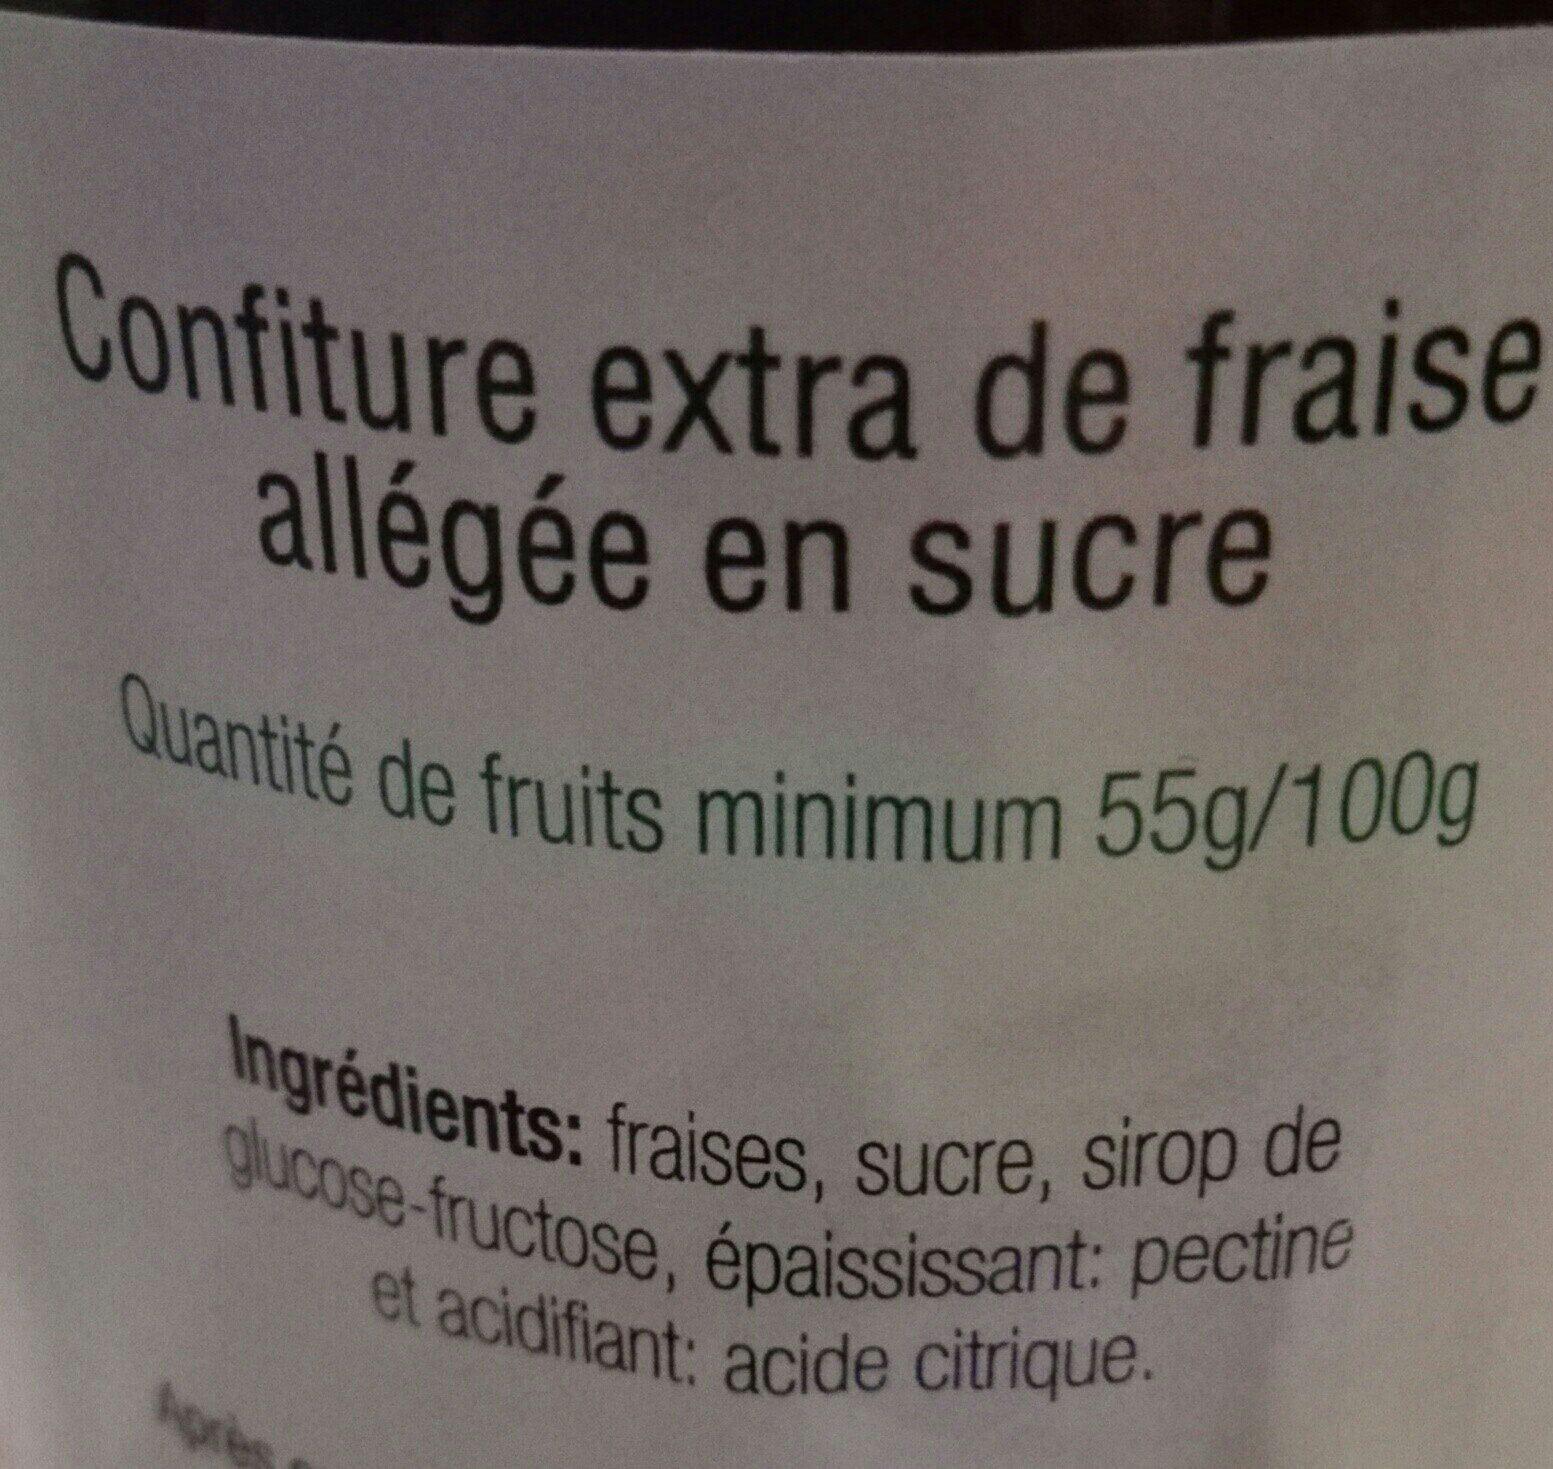 Confiture extra de fraise allegée en sucre - Ingrediënten - fr